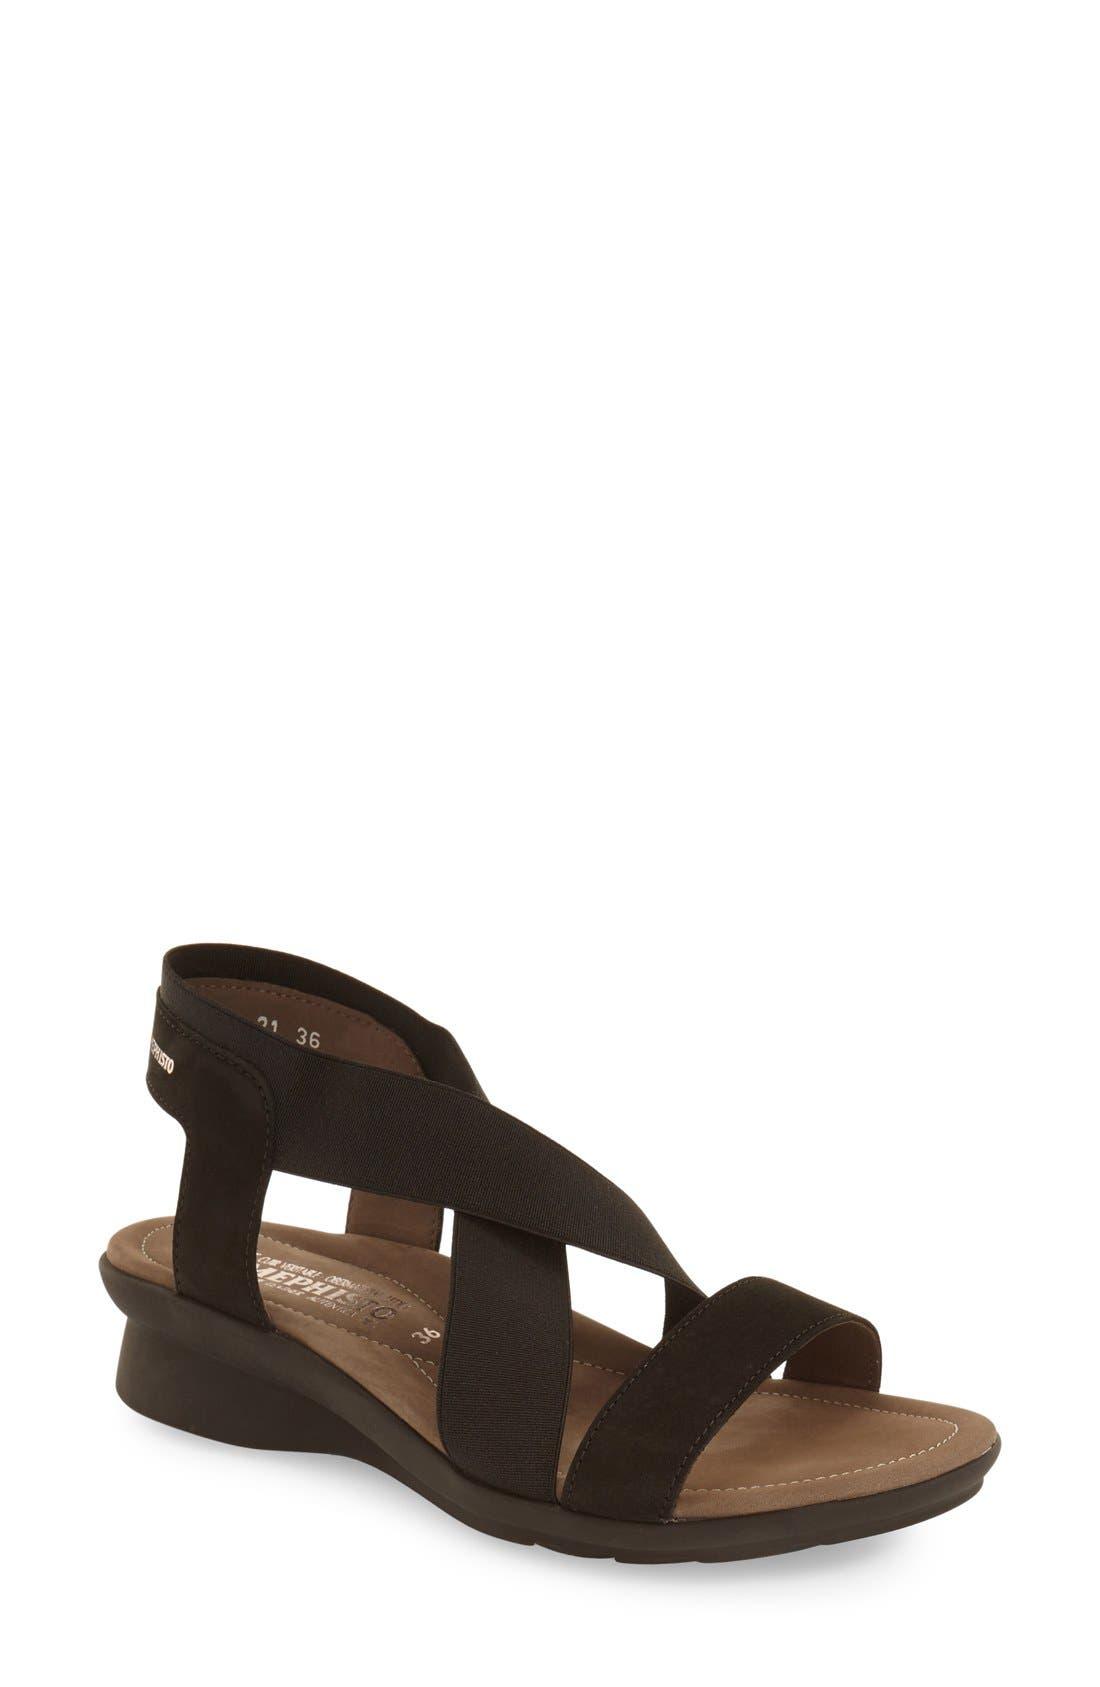 MEPHISTO, 'Pastora' Sandal, Main thumbnail 1, color, BLACK BUCKSOFT